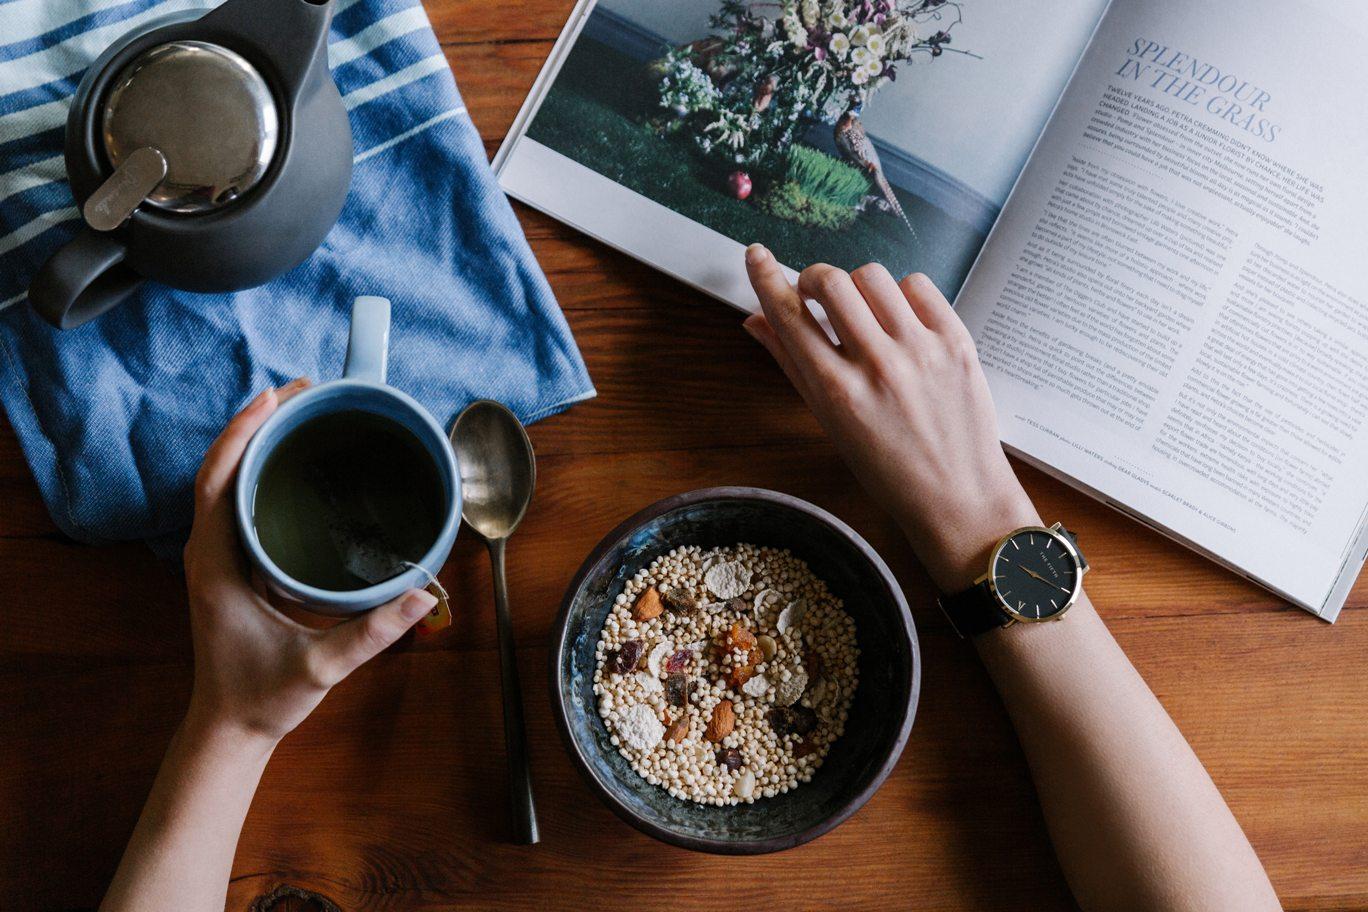 jago bahasa inggris dengan membaca buku, artikel, dan berita